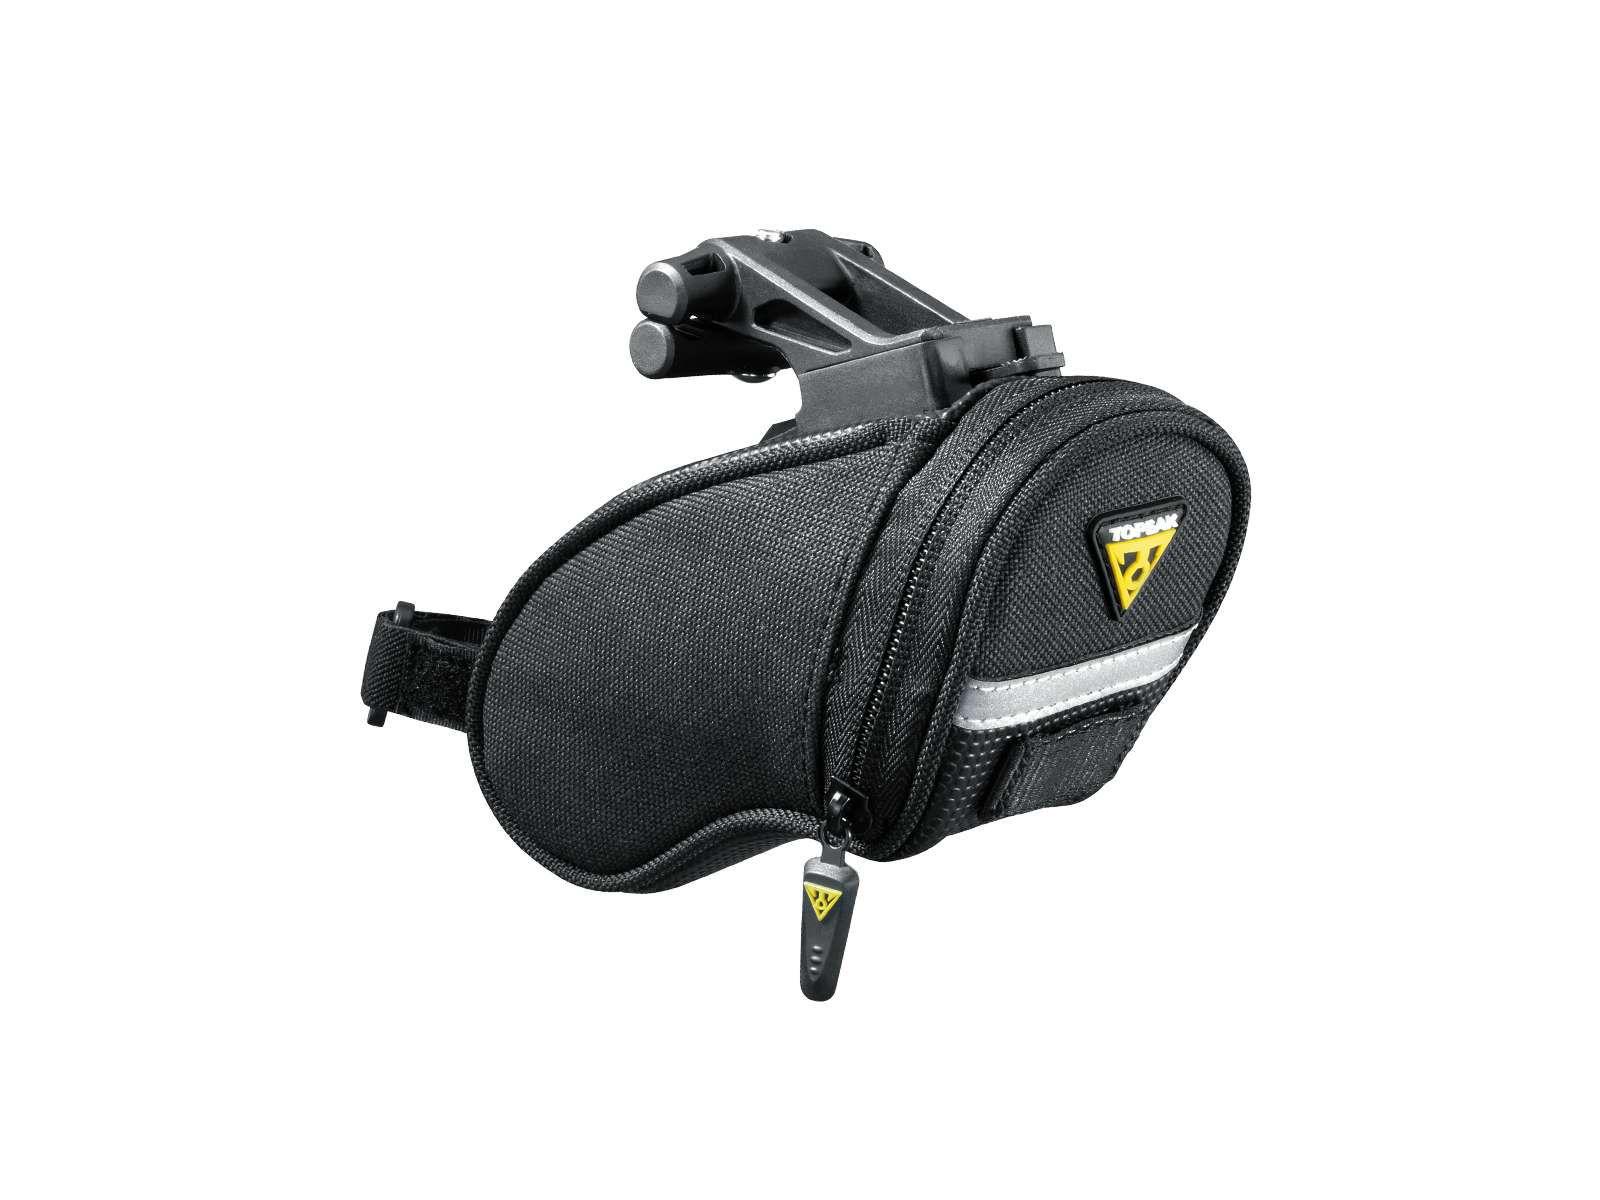 Bolsa de Selim - Topeak - Aero Wedge Pack Com Quick Click